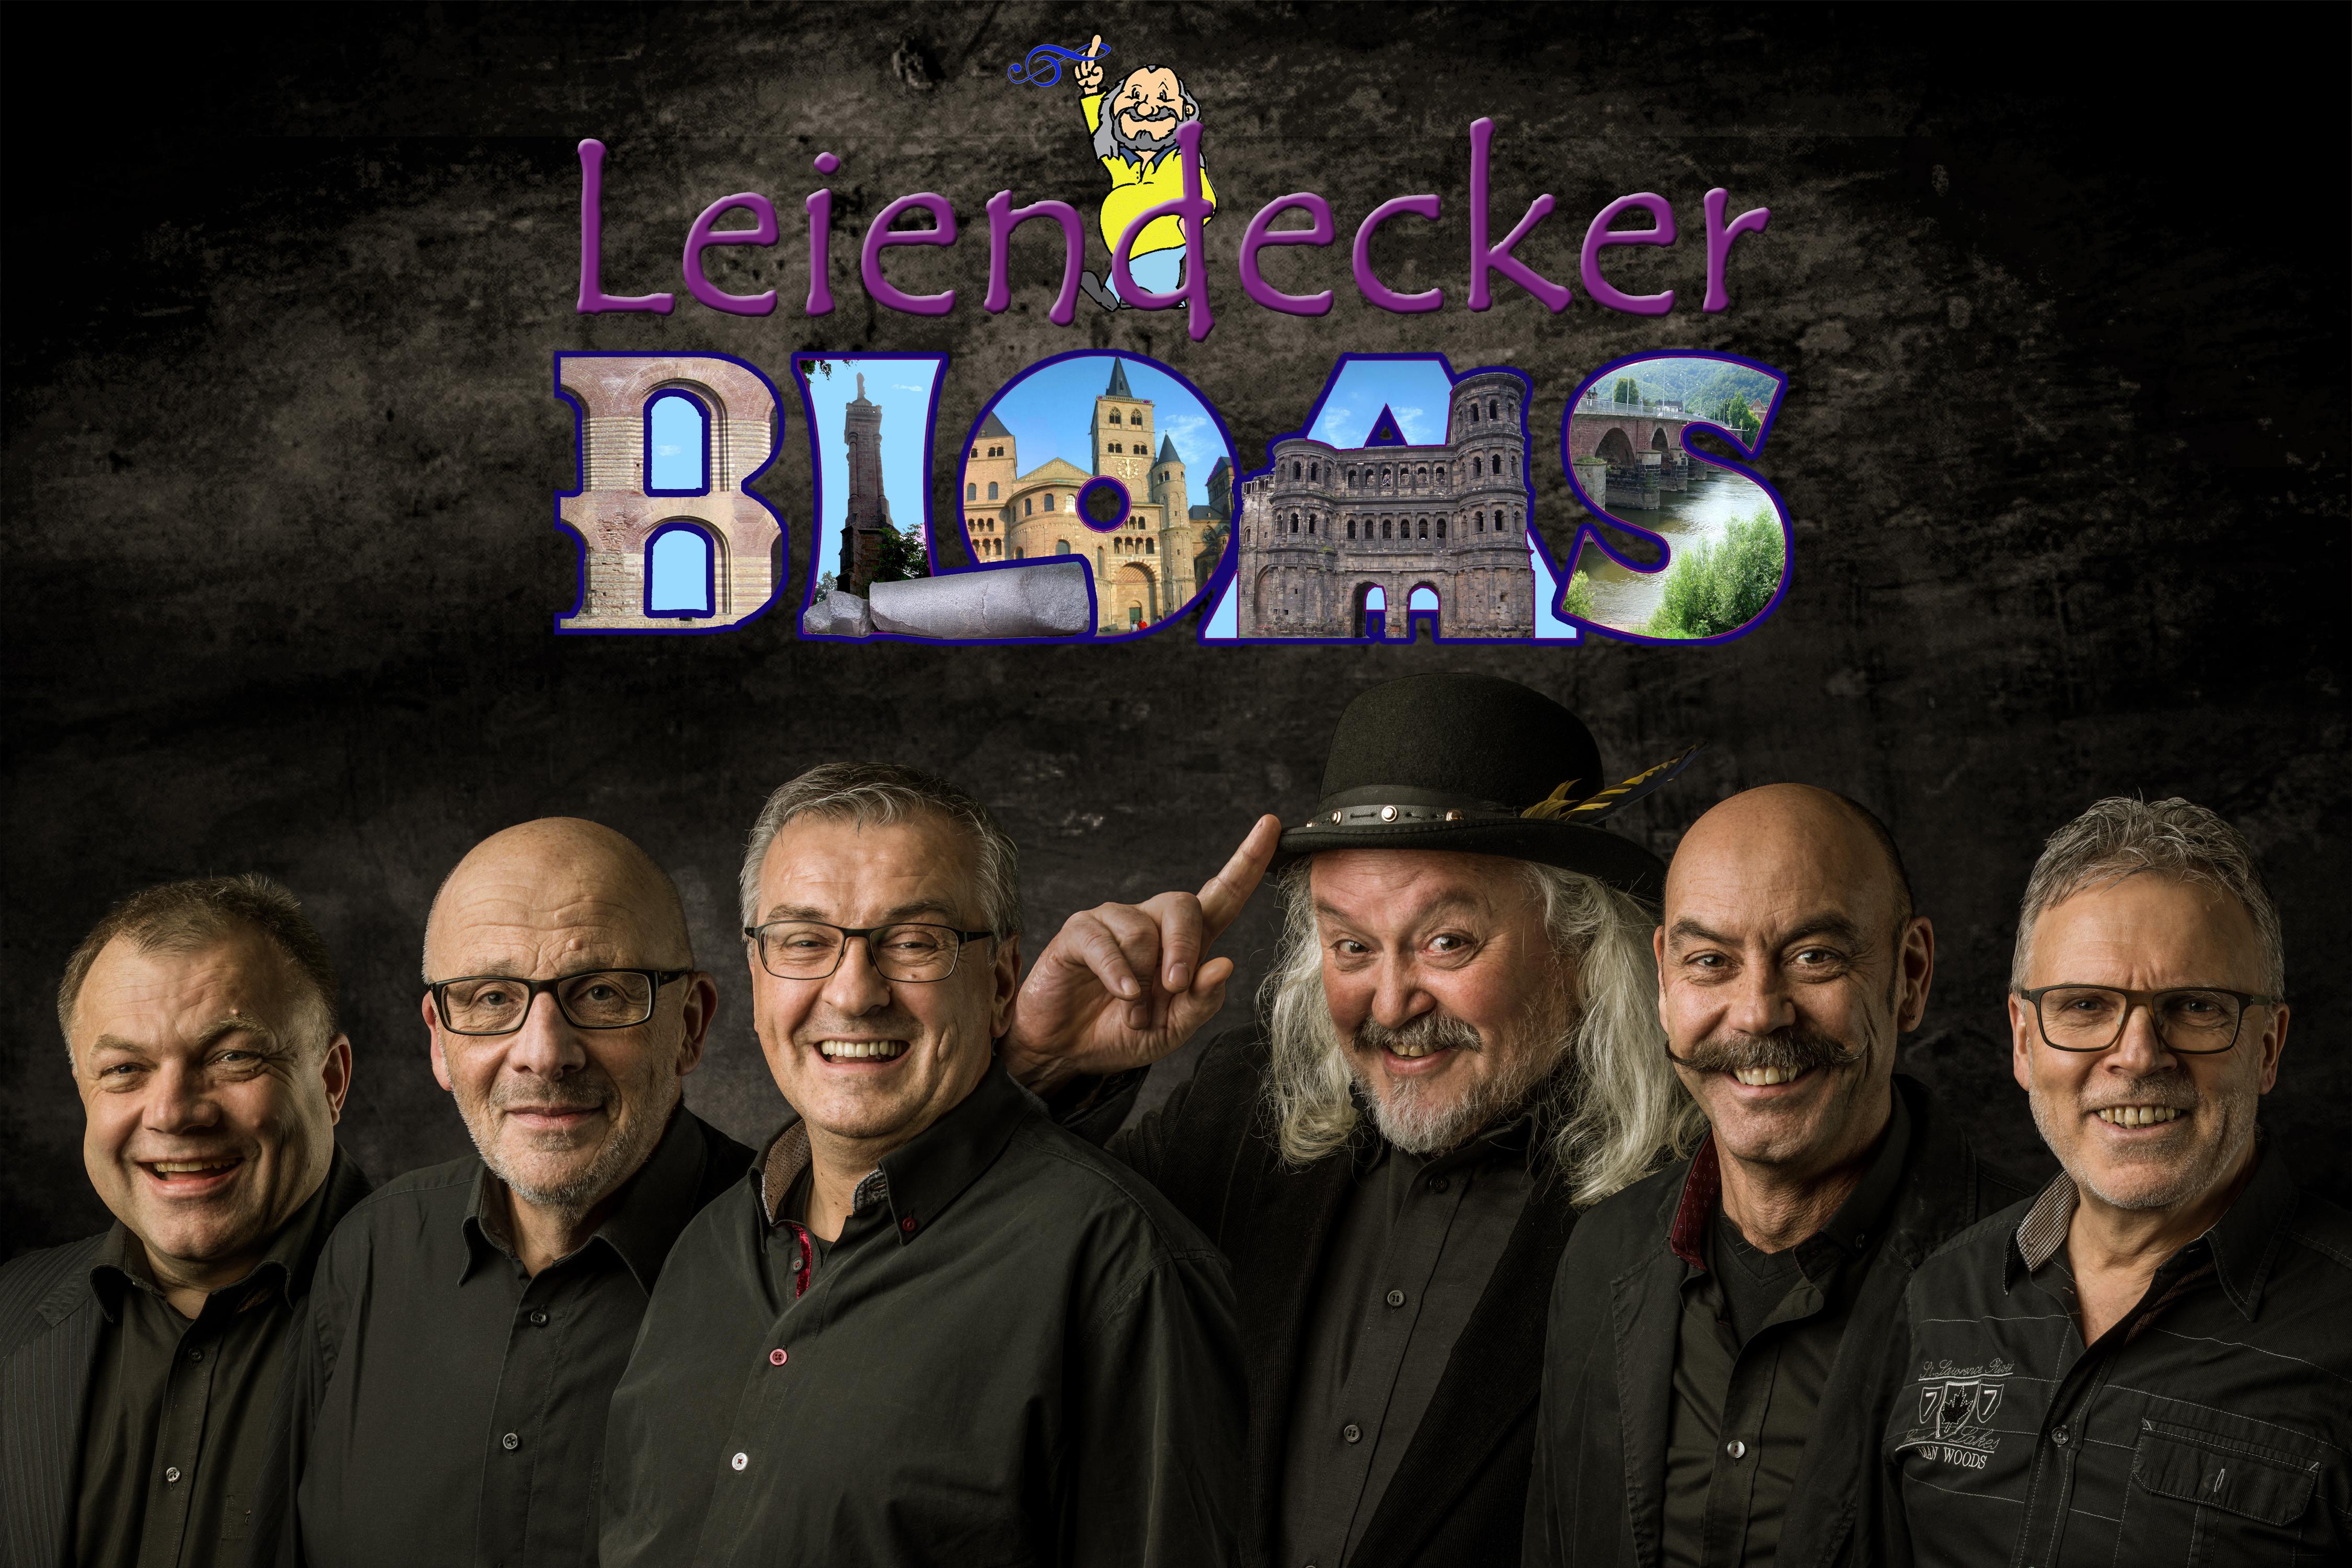 leiendecker_bloas_presse_foto (1)